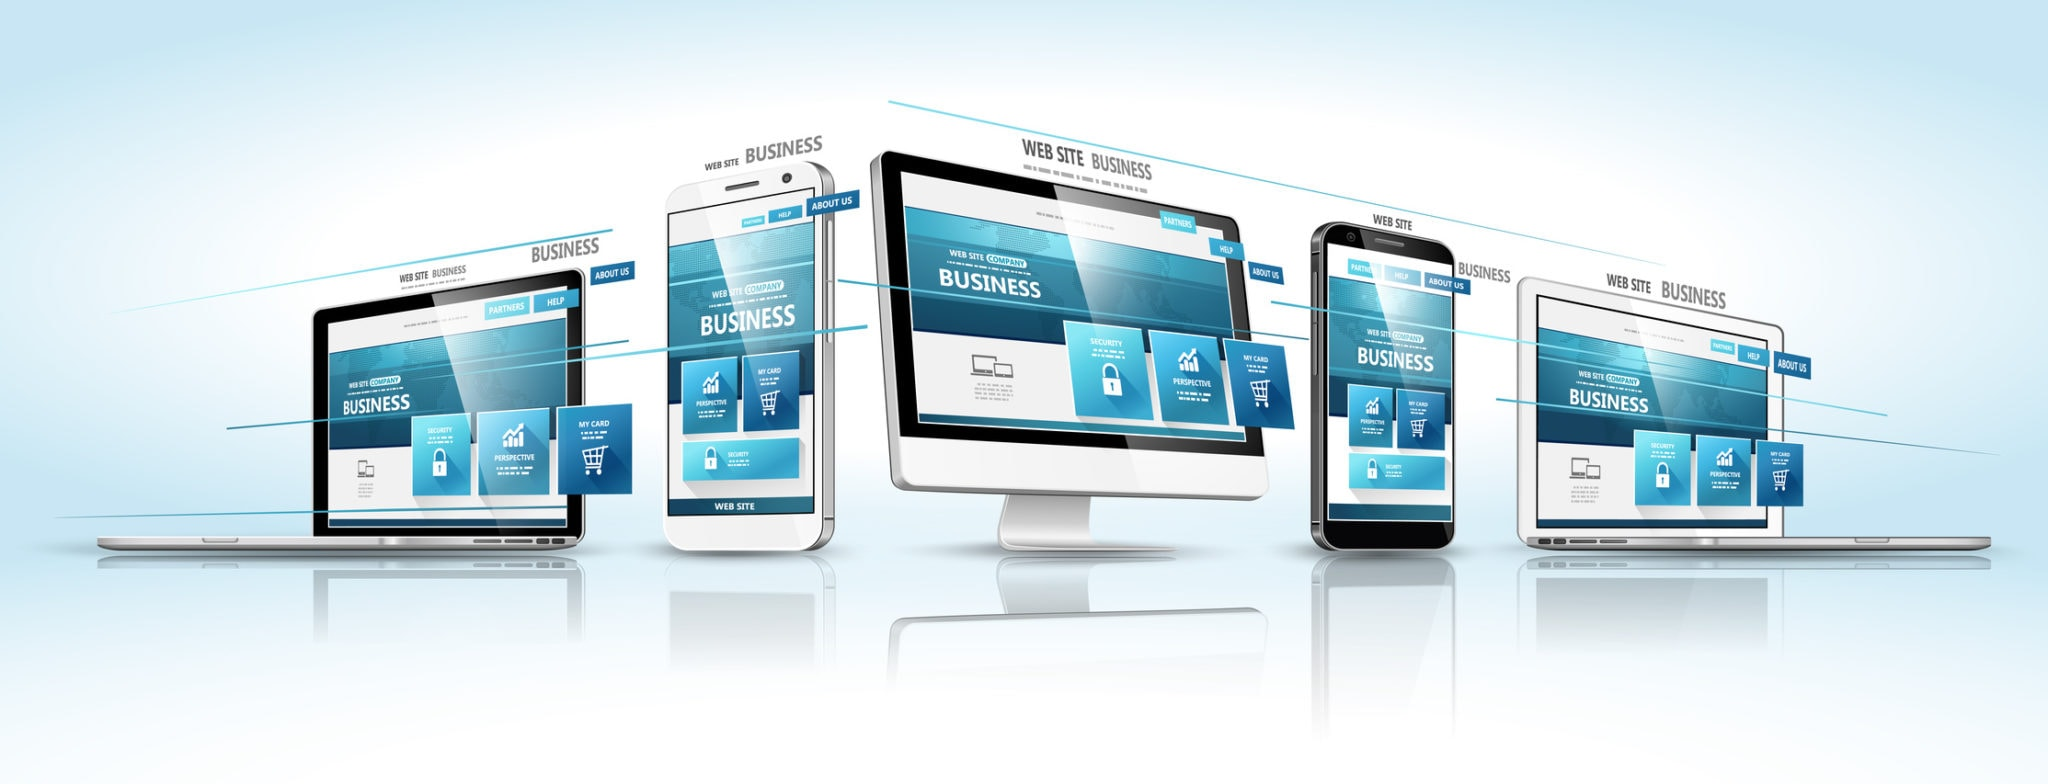 Mobile SEO podstawowe rekomendacje